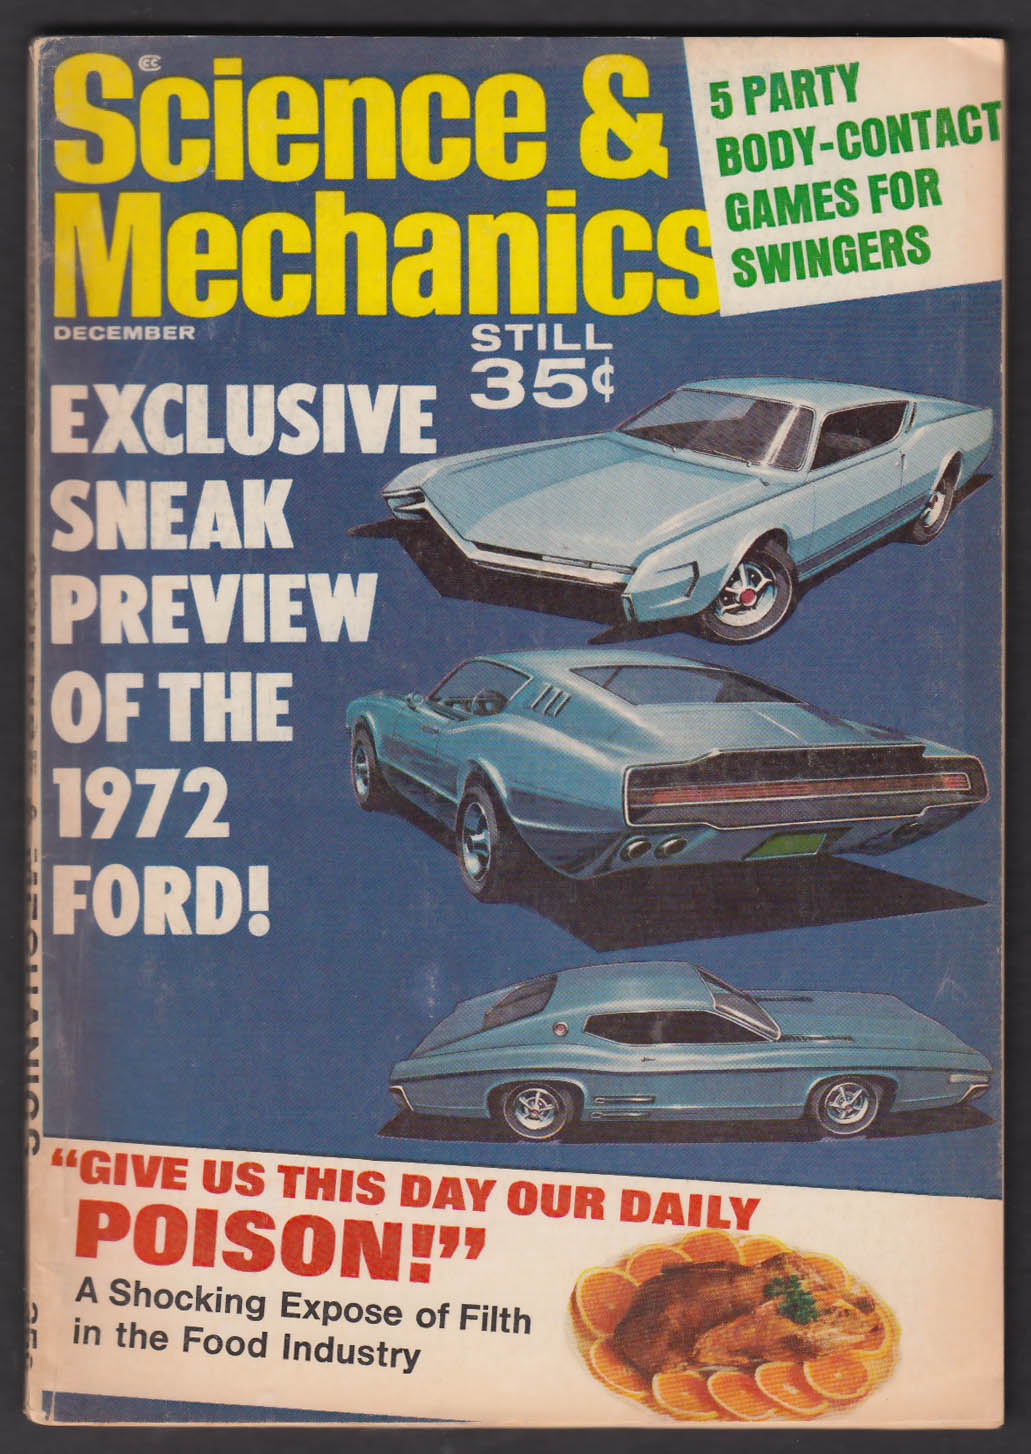 SCIENCE & MECHANICS Jaguar XK-E test BSA Rocket 1972 Ford sneak preview 12 1968